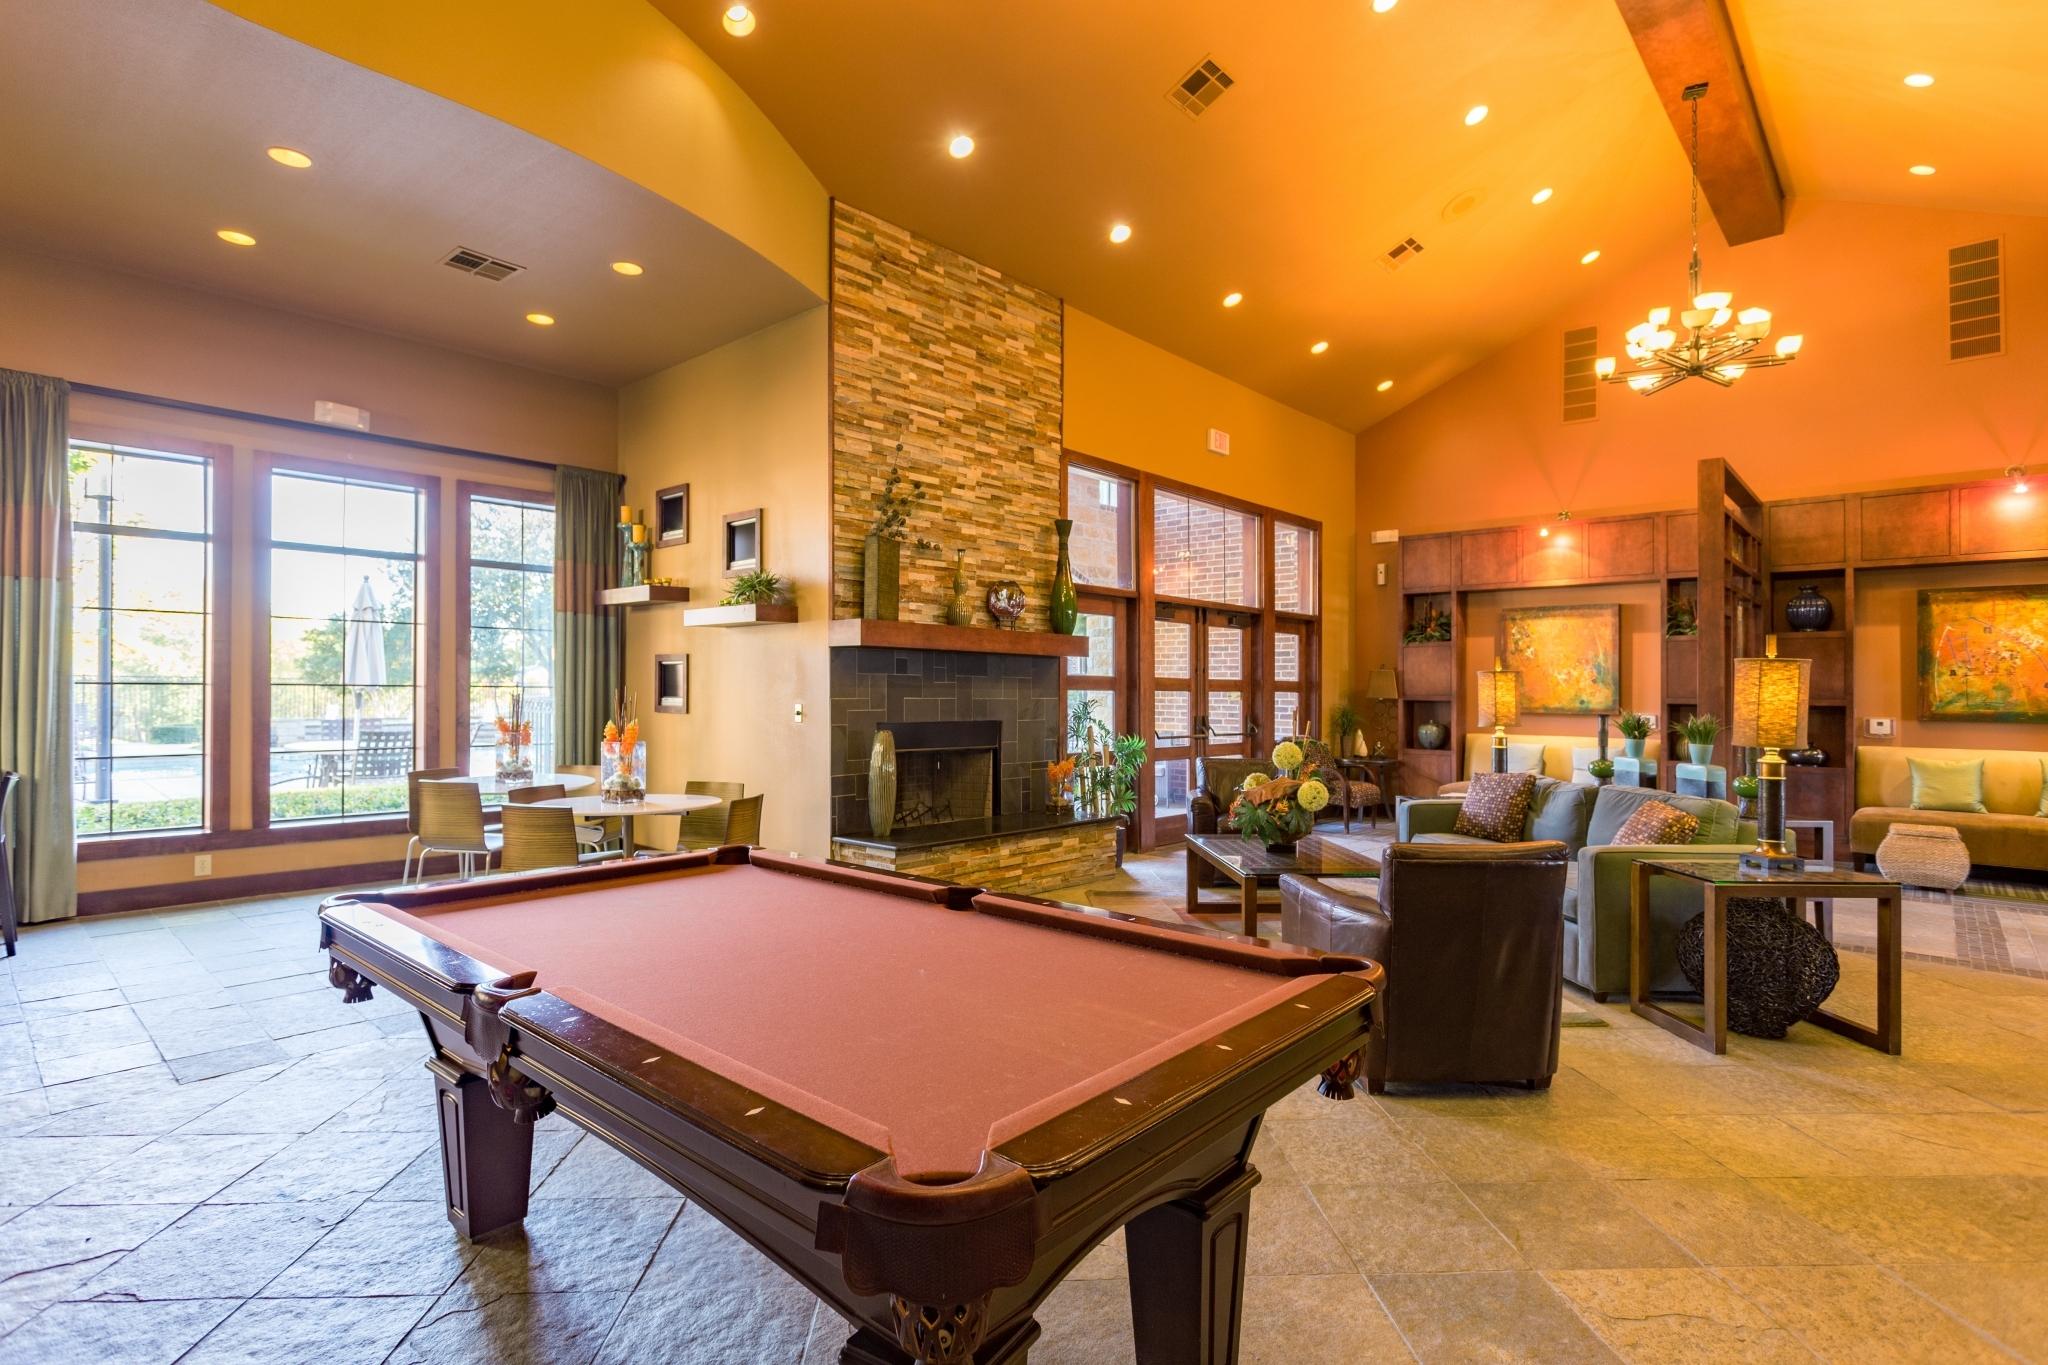 Estates at Vista Ridge - Imagine living the lifestyle your dreams are made of at Estates at Vista Ridge